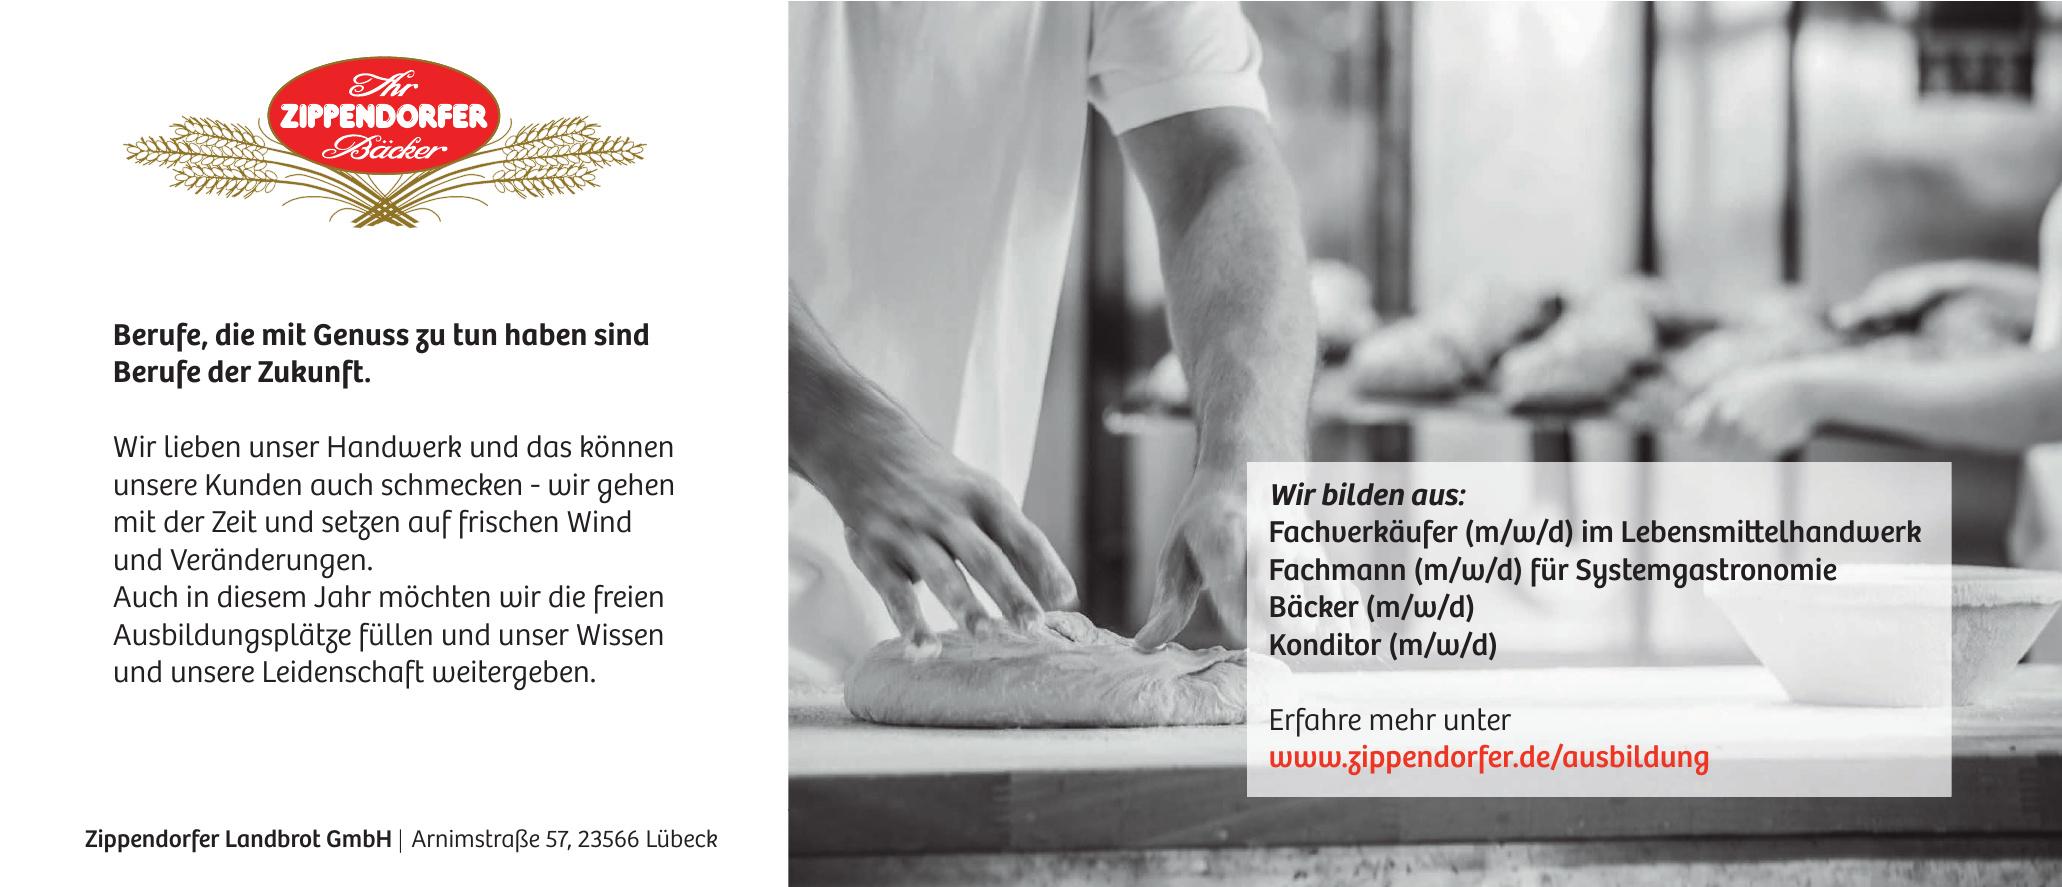 Zippendorfer Landbrot GmbH Weinfest 2018